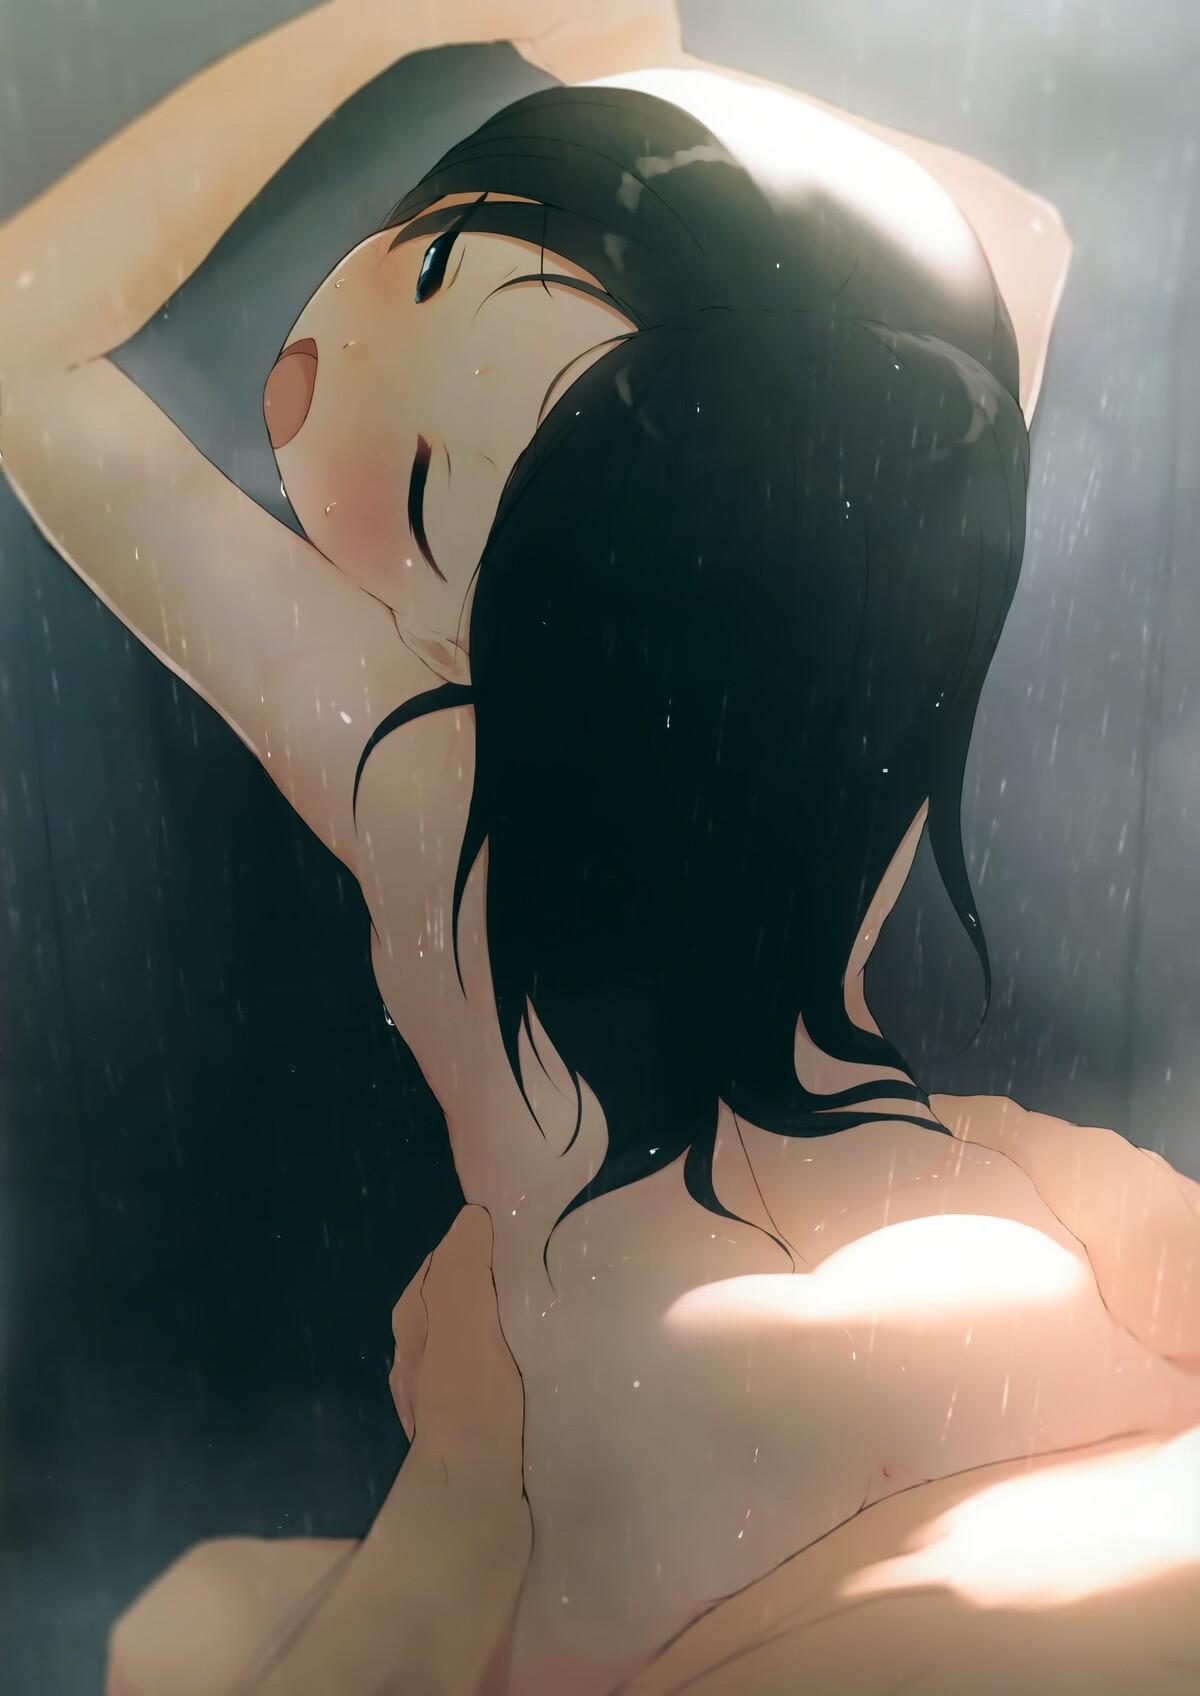 loli completely_nude617